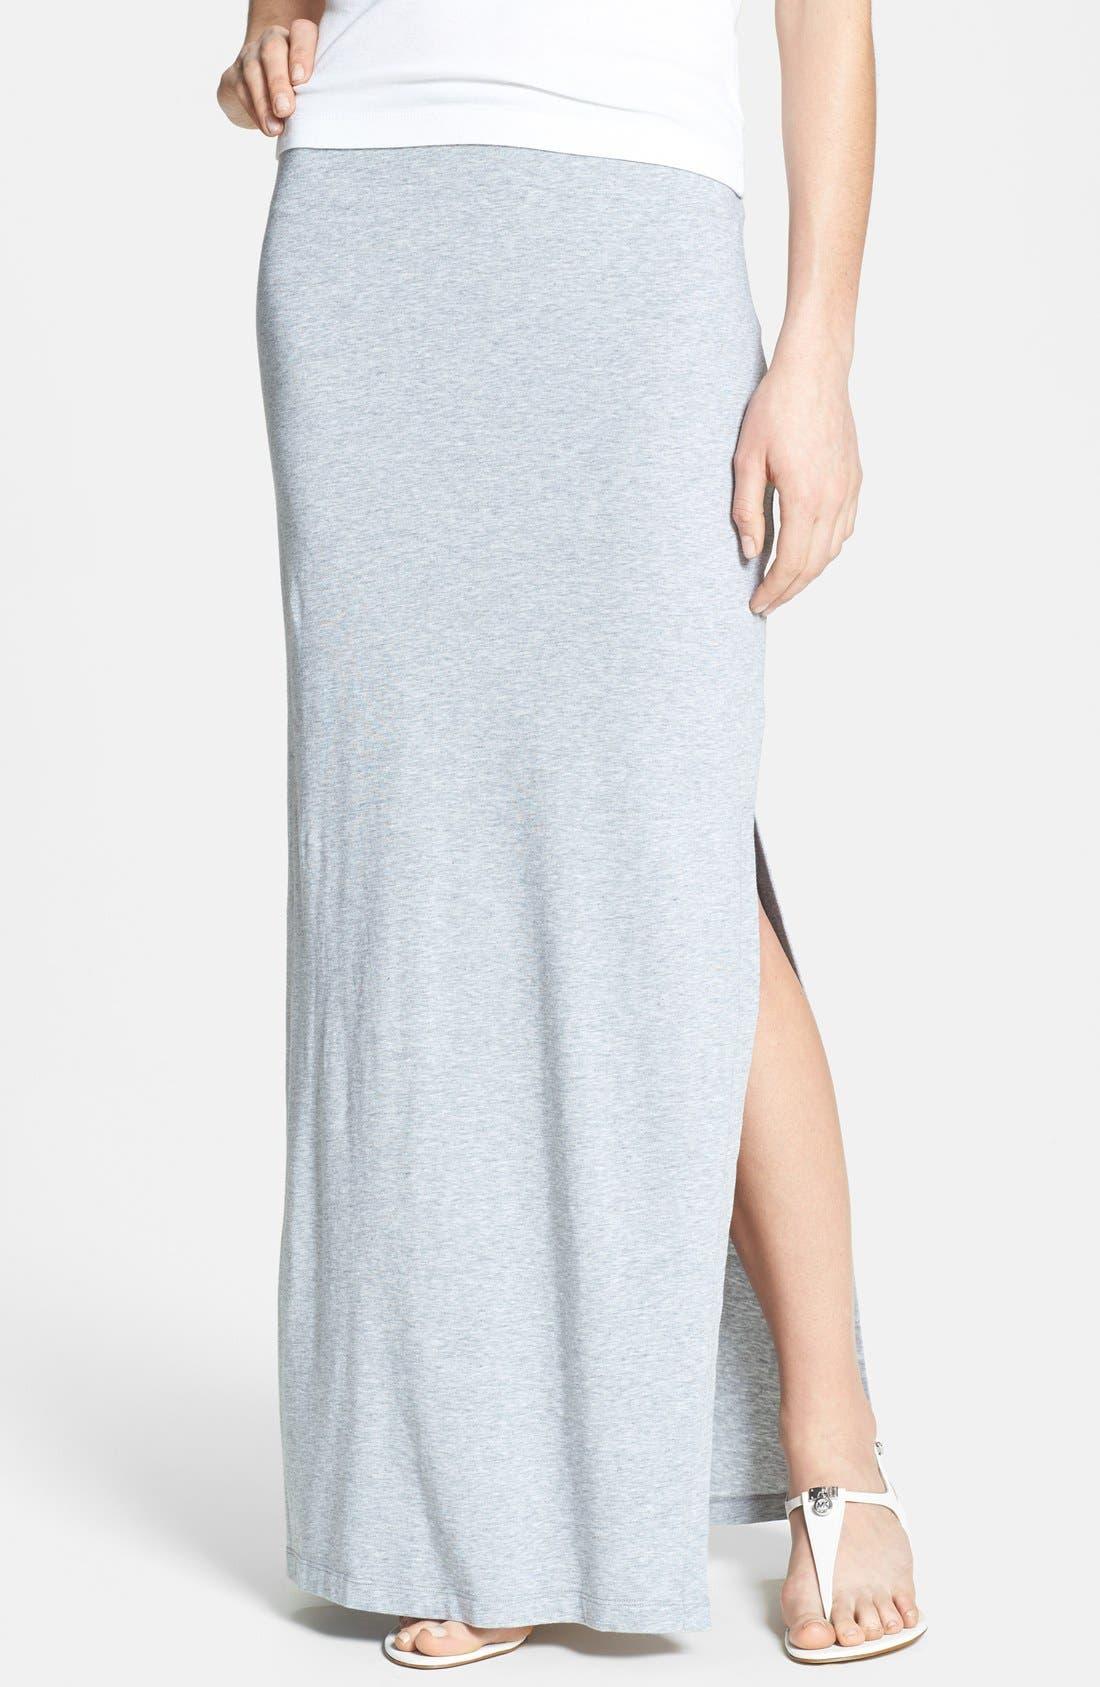 Alternate Image 1 Selected - MICHAEL Michael Kors Side Slit Stretch Knit Maxi Skirt